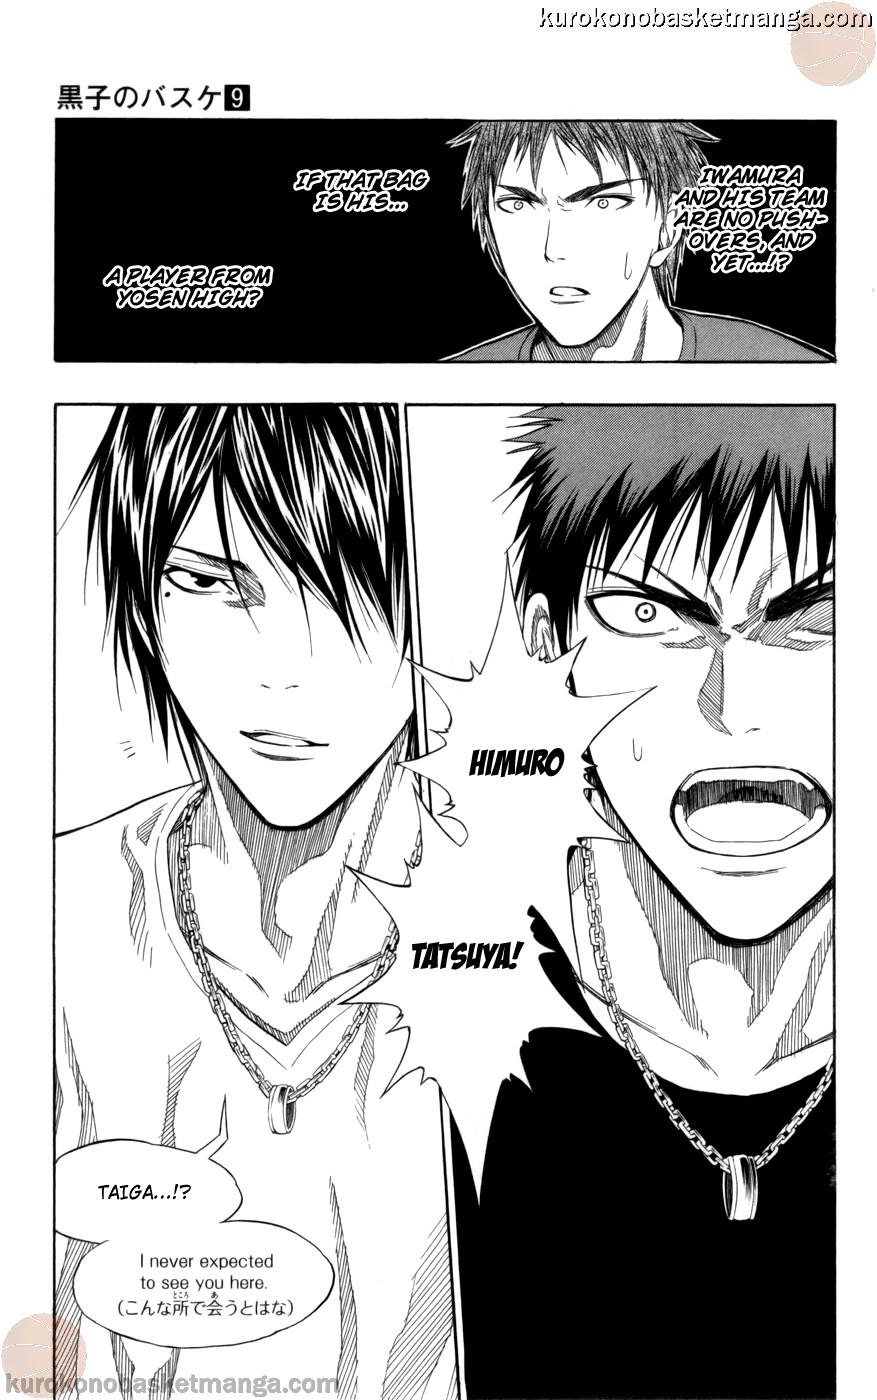 Kuroko no Basket Manga Chapter 75 - Image 19